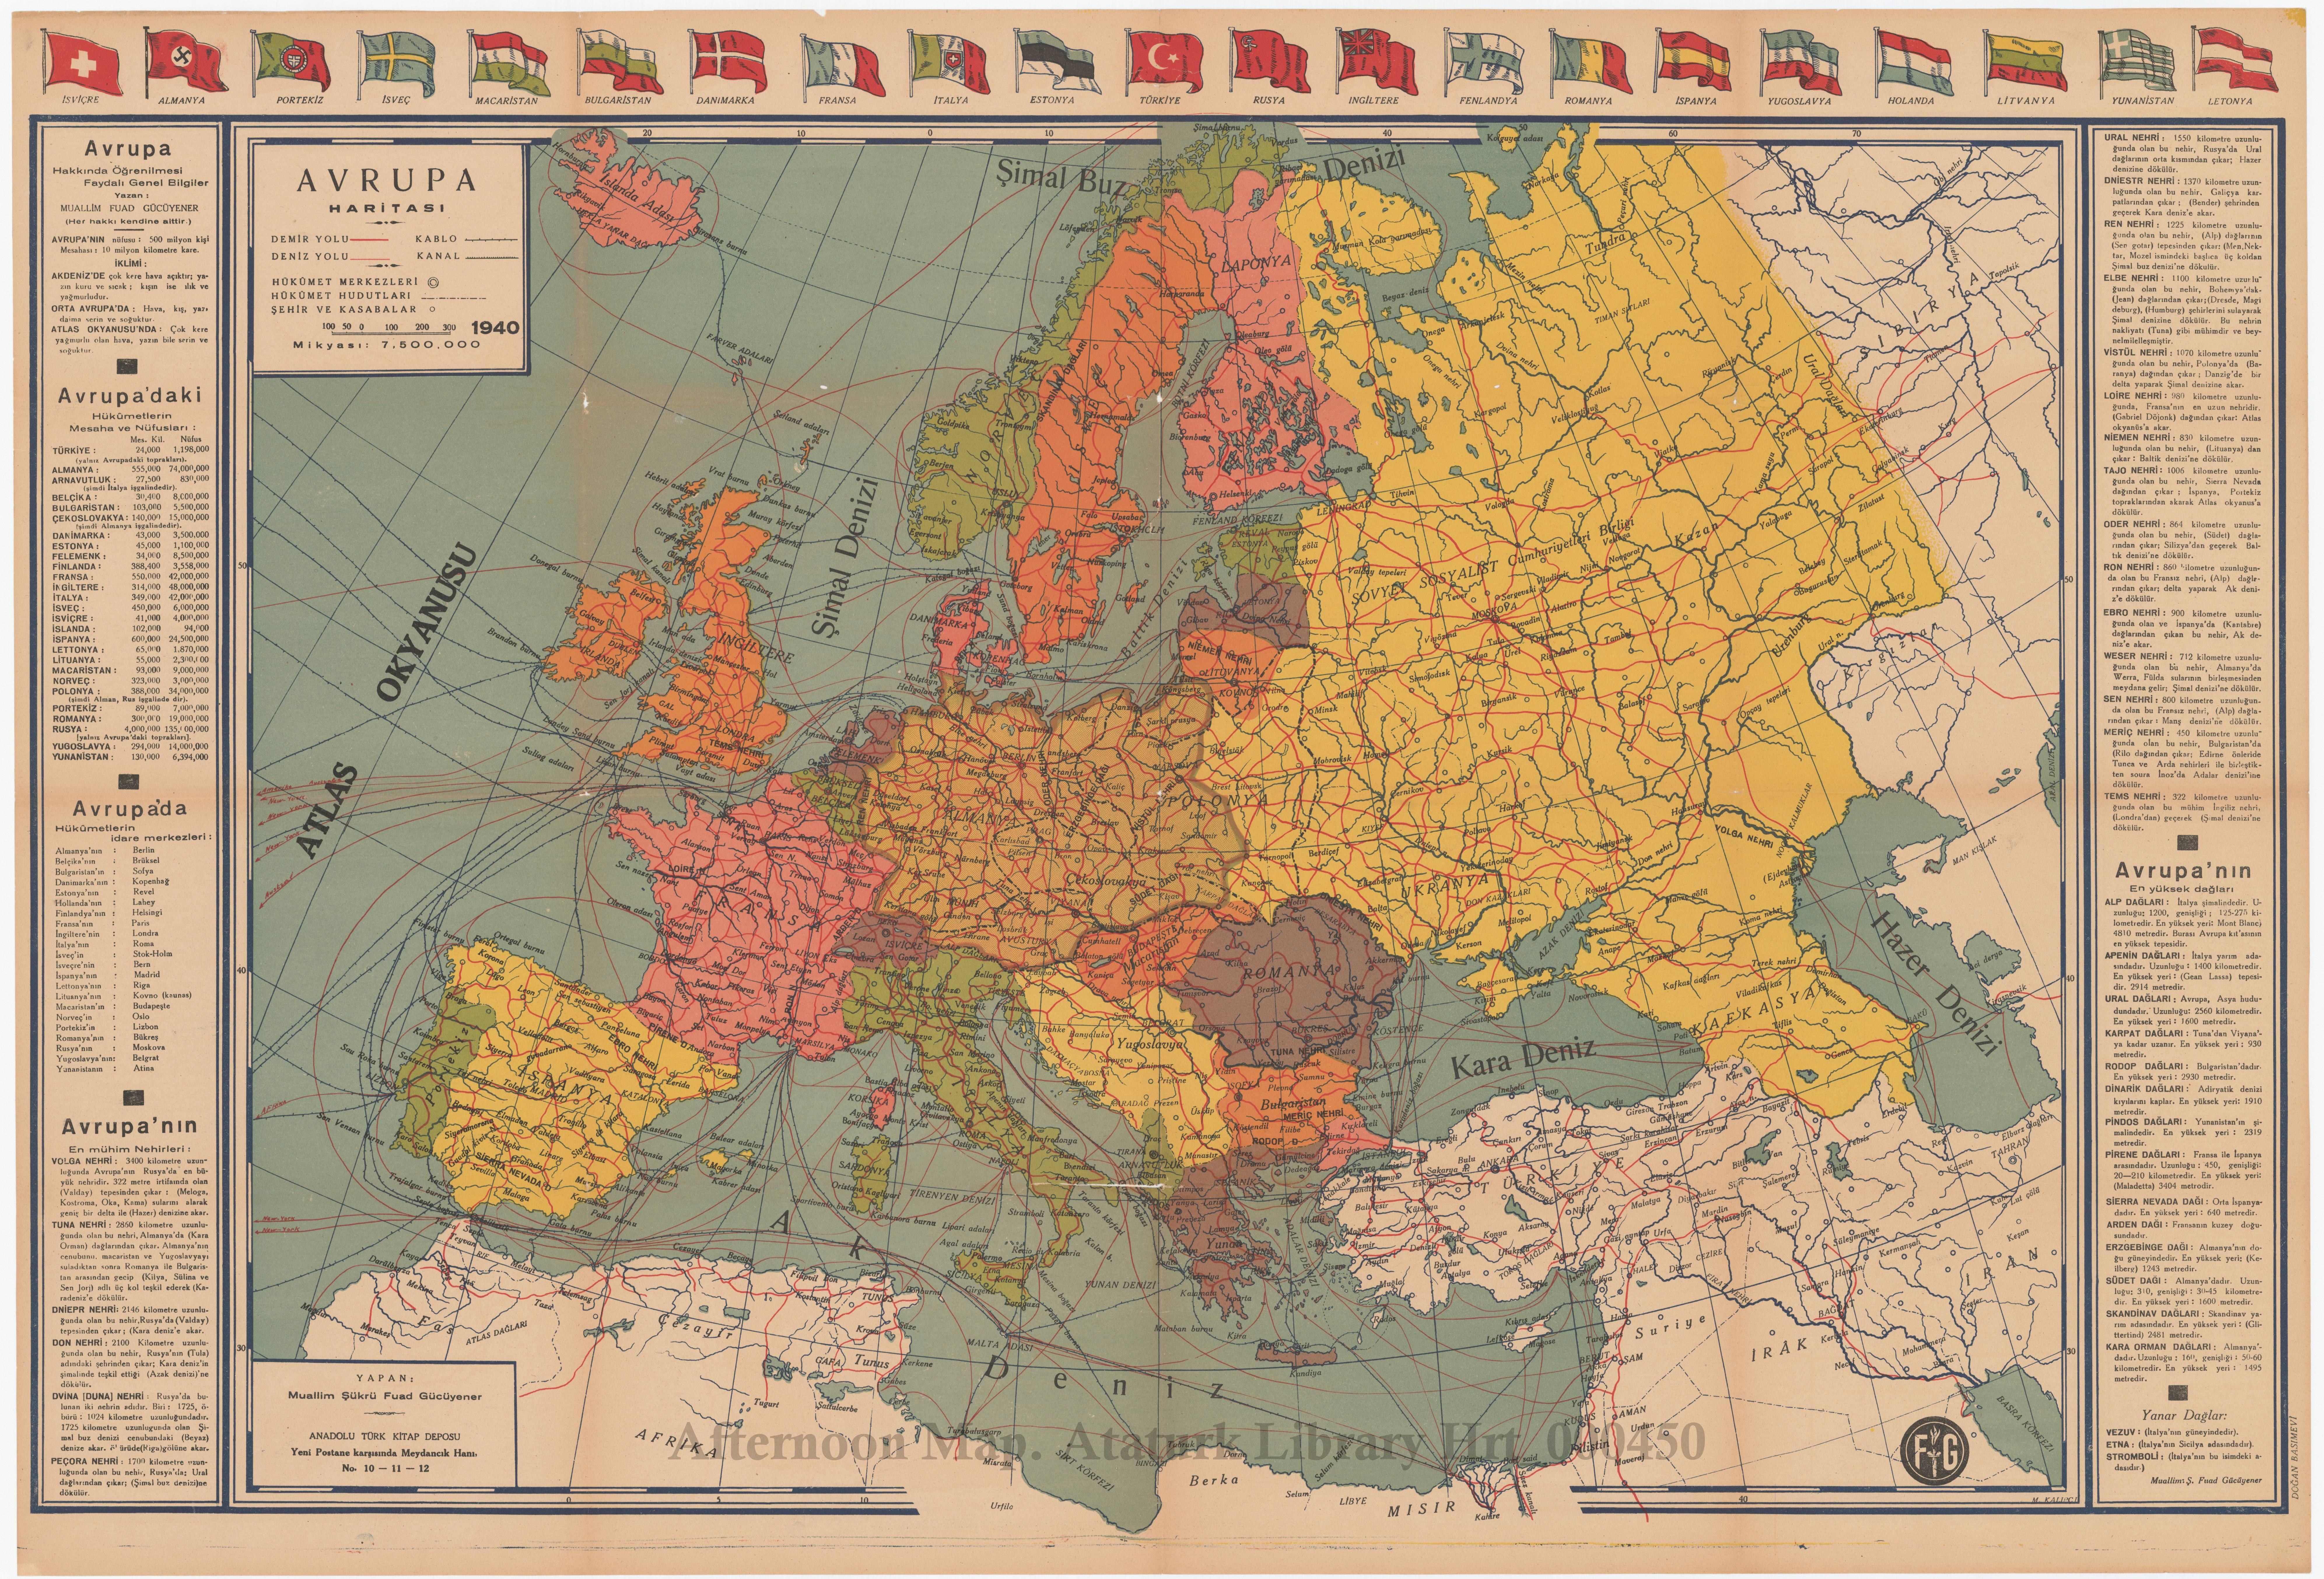 Afternoon Map: Europe at War